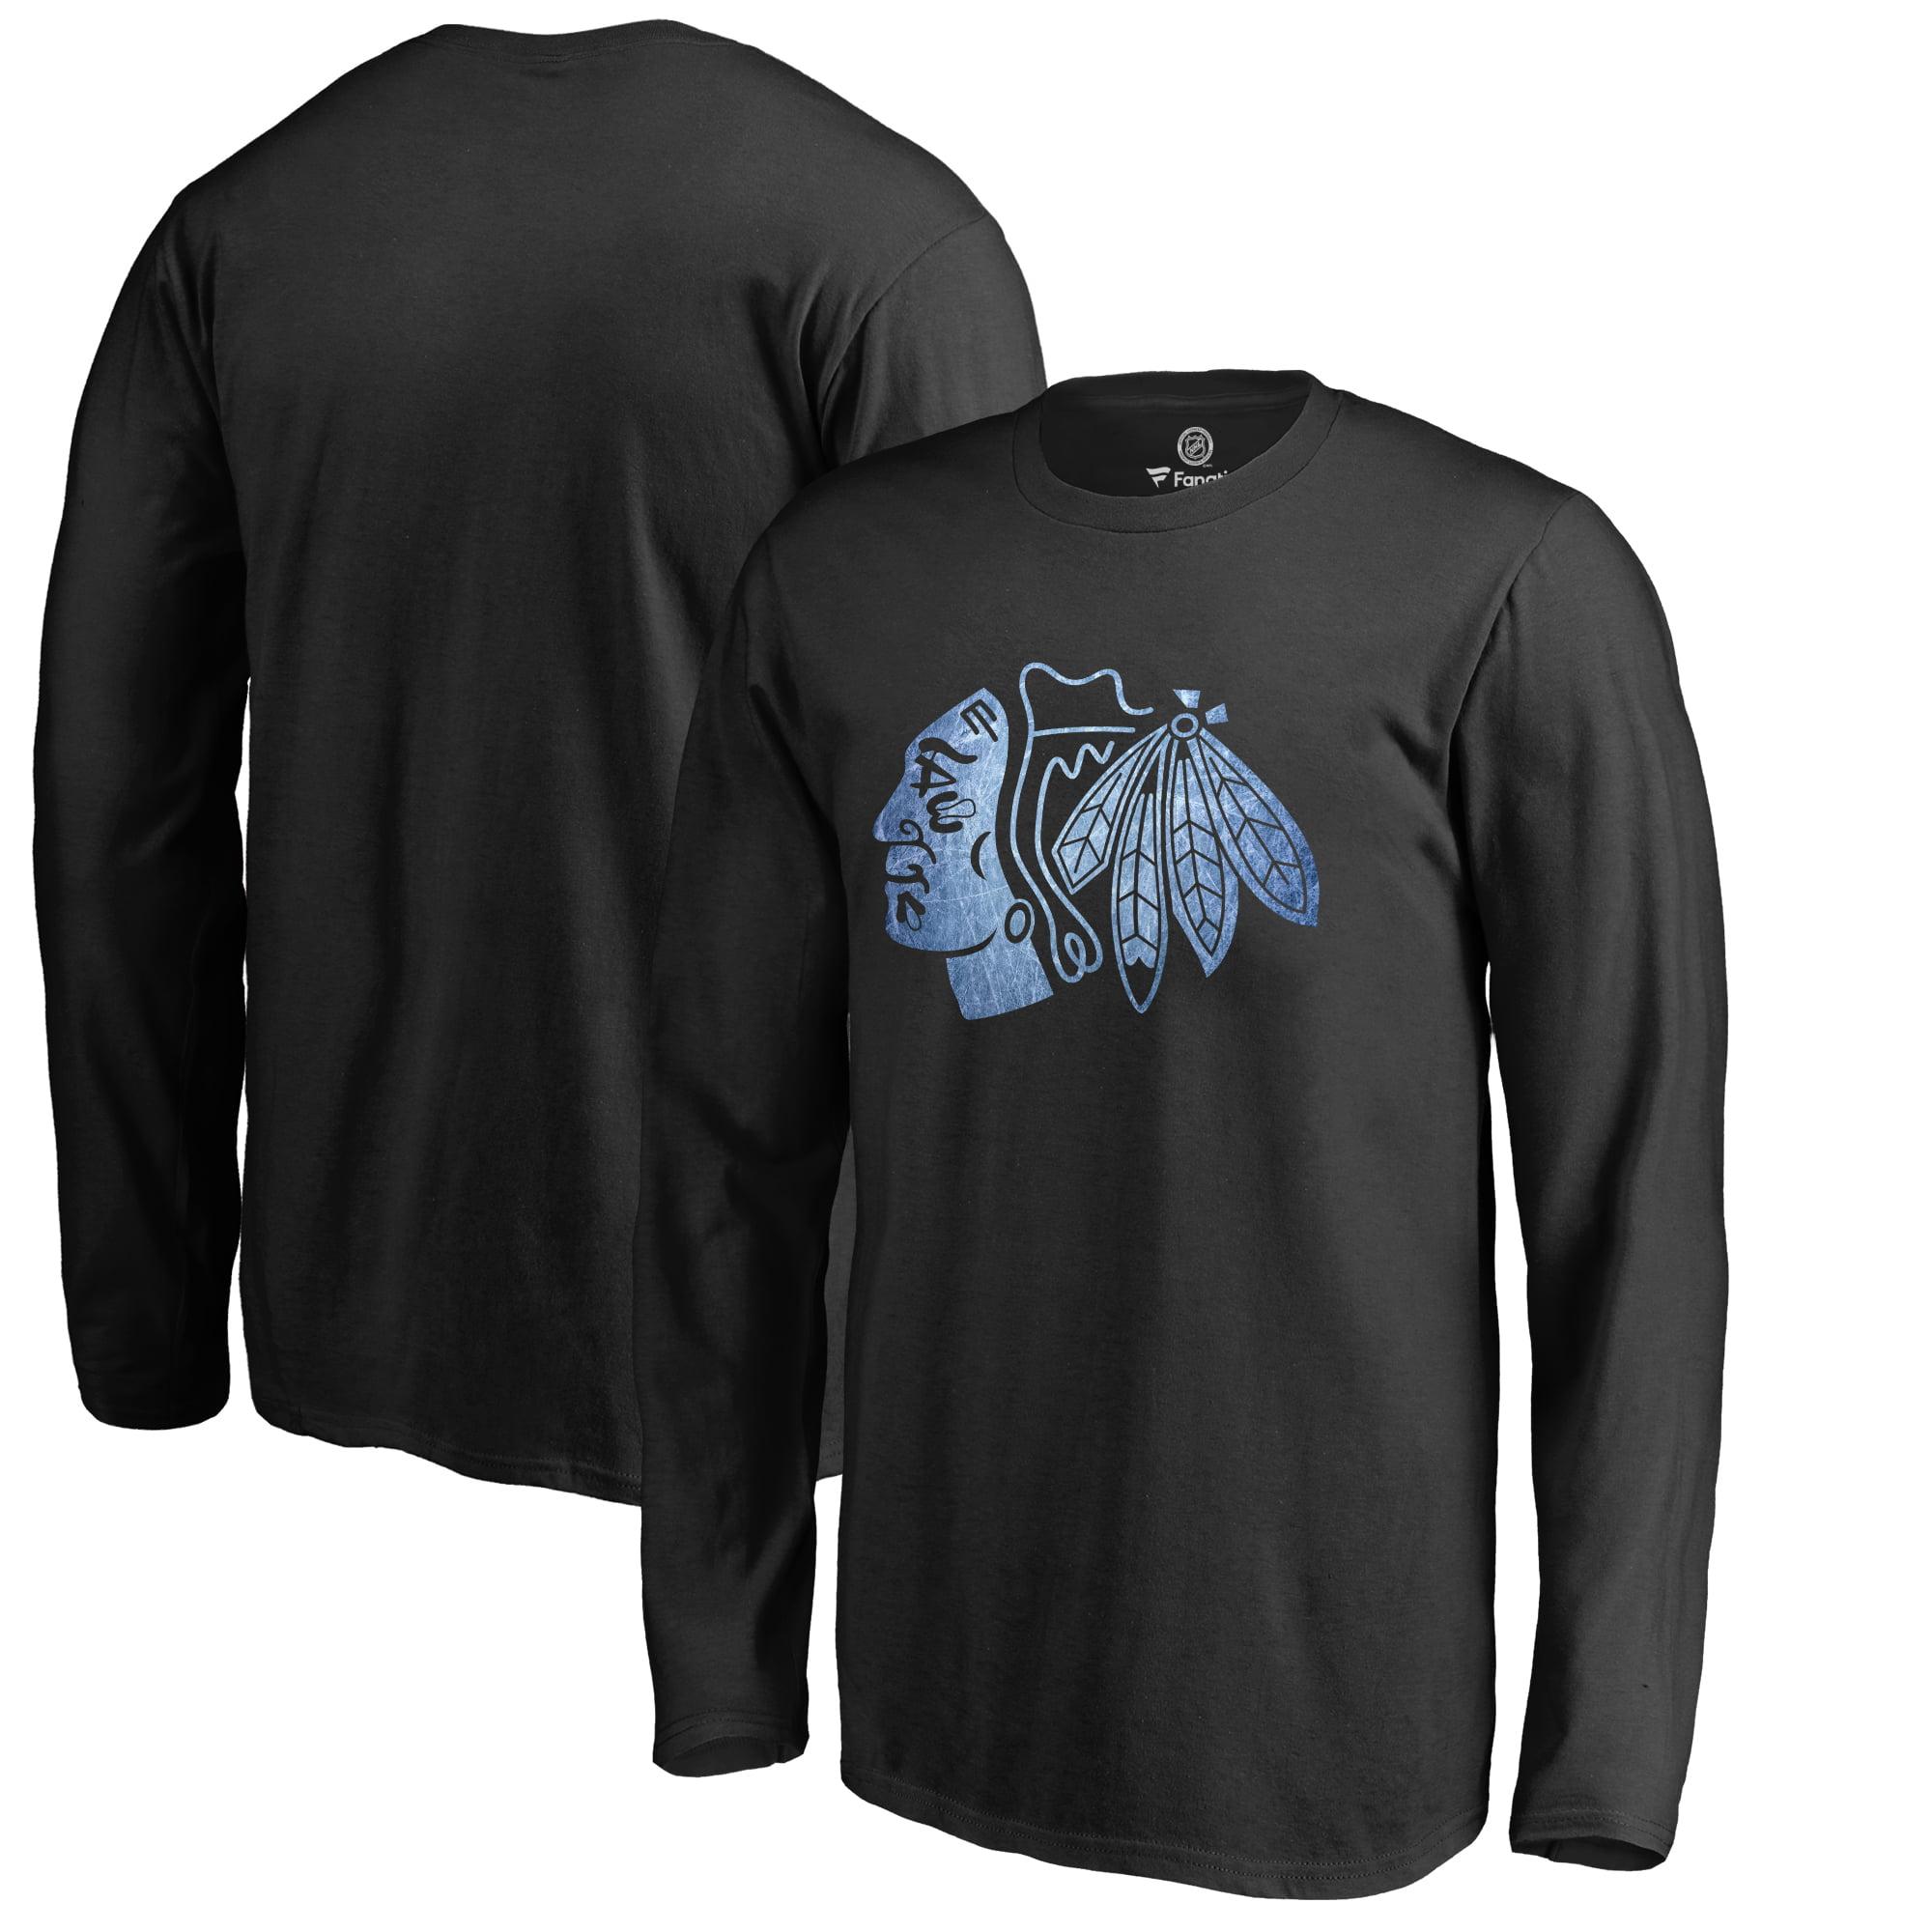 Chicago Blackhawks Youth Pond Hockey Long Sleeve T-Shirt Black by Football Fanatics/Ruppshirts